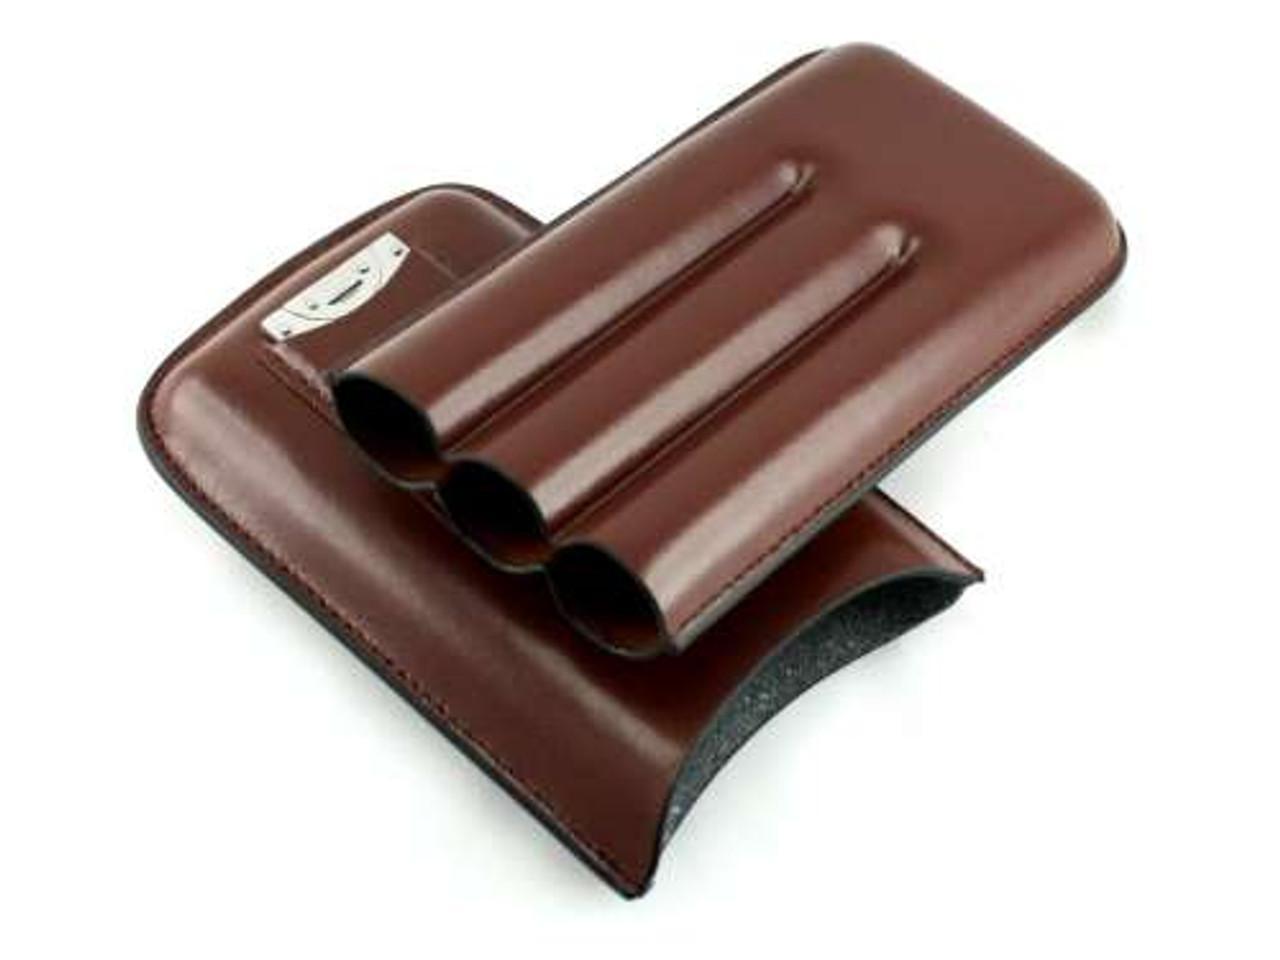 Brown Dalton Cigar Case with Cutter